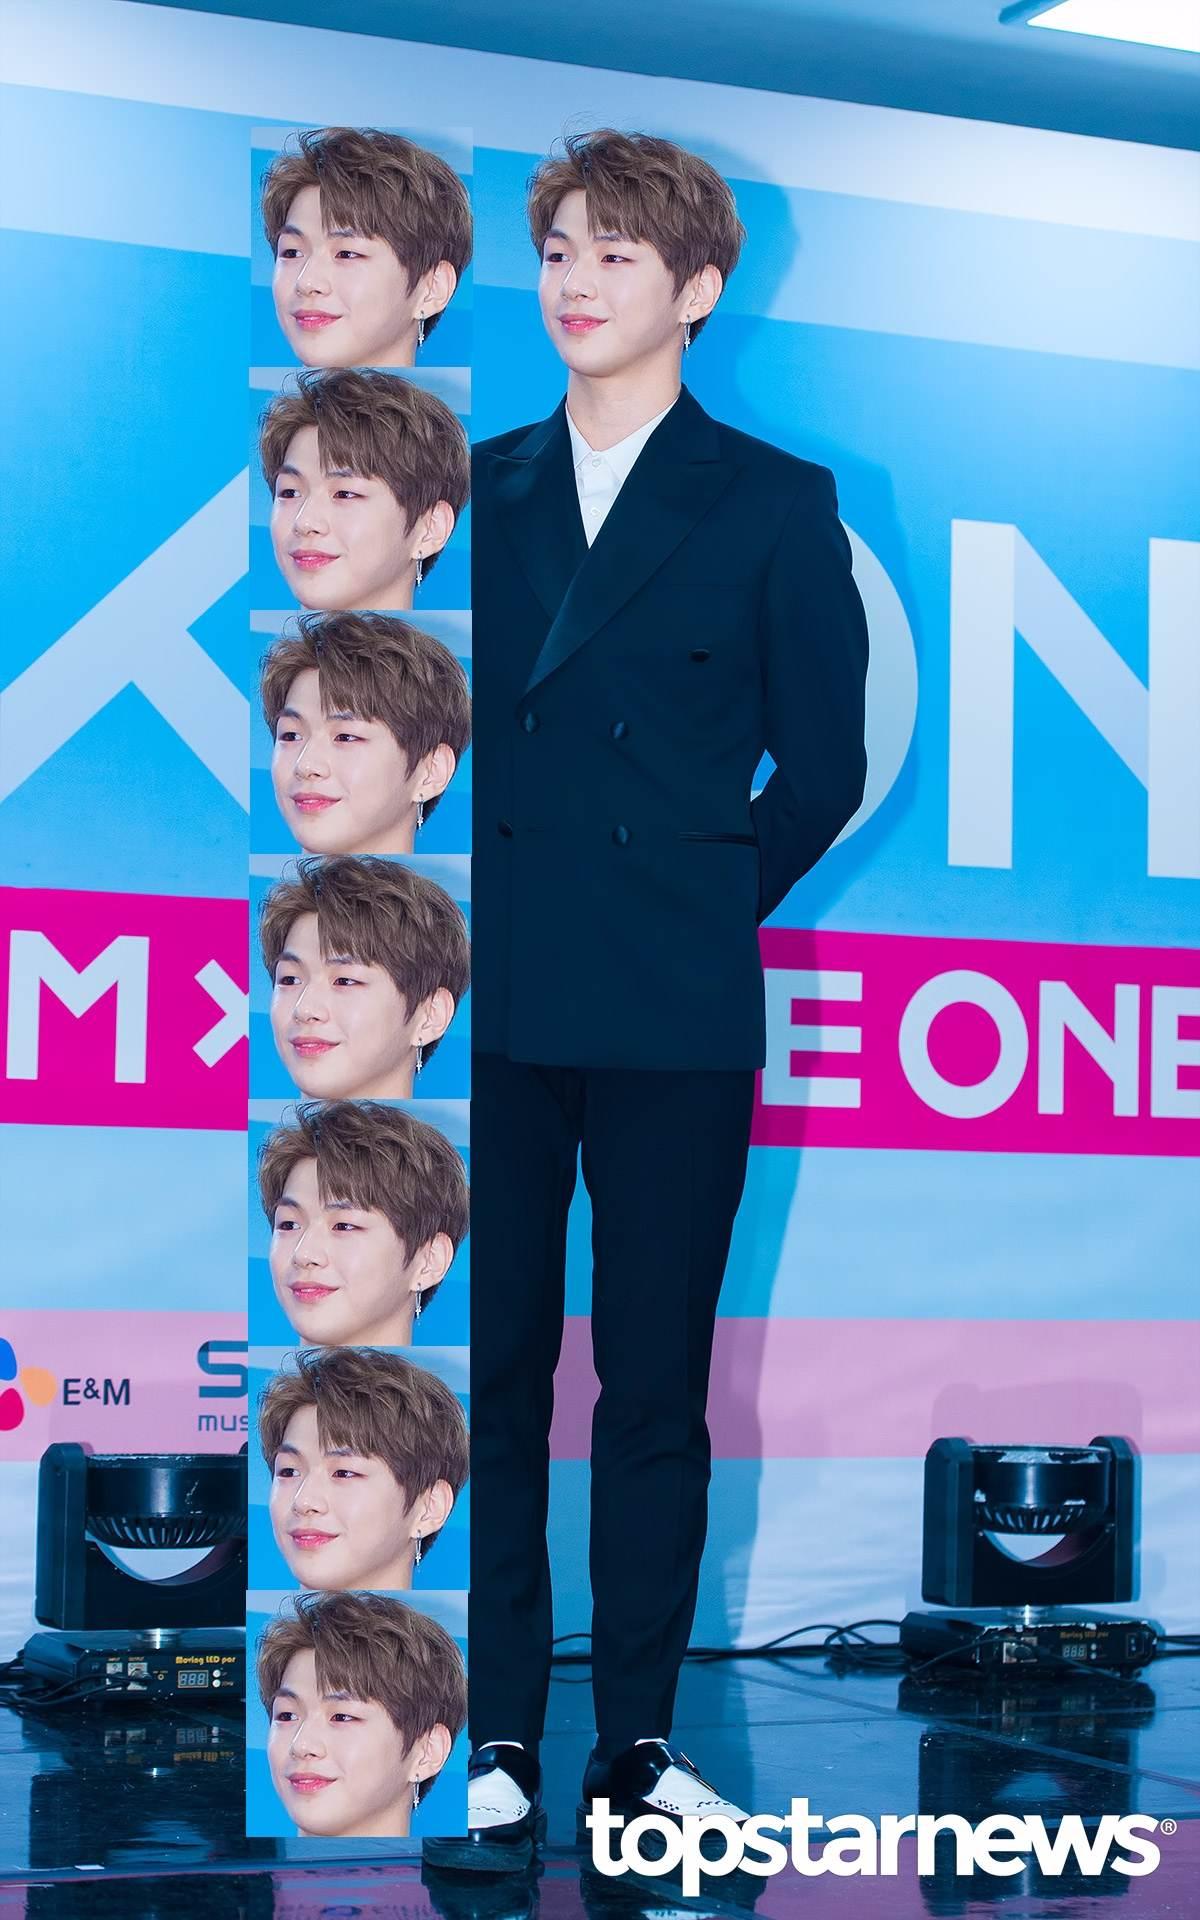 WANNAON成員姜丹尼爾呆萌的笑容擄獲不少姐姐飯的心~~ 身高180cm,體重67kg的他可是擁有超標準身材呢!